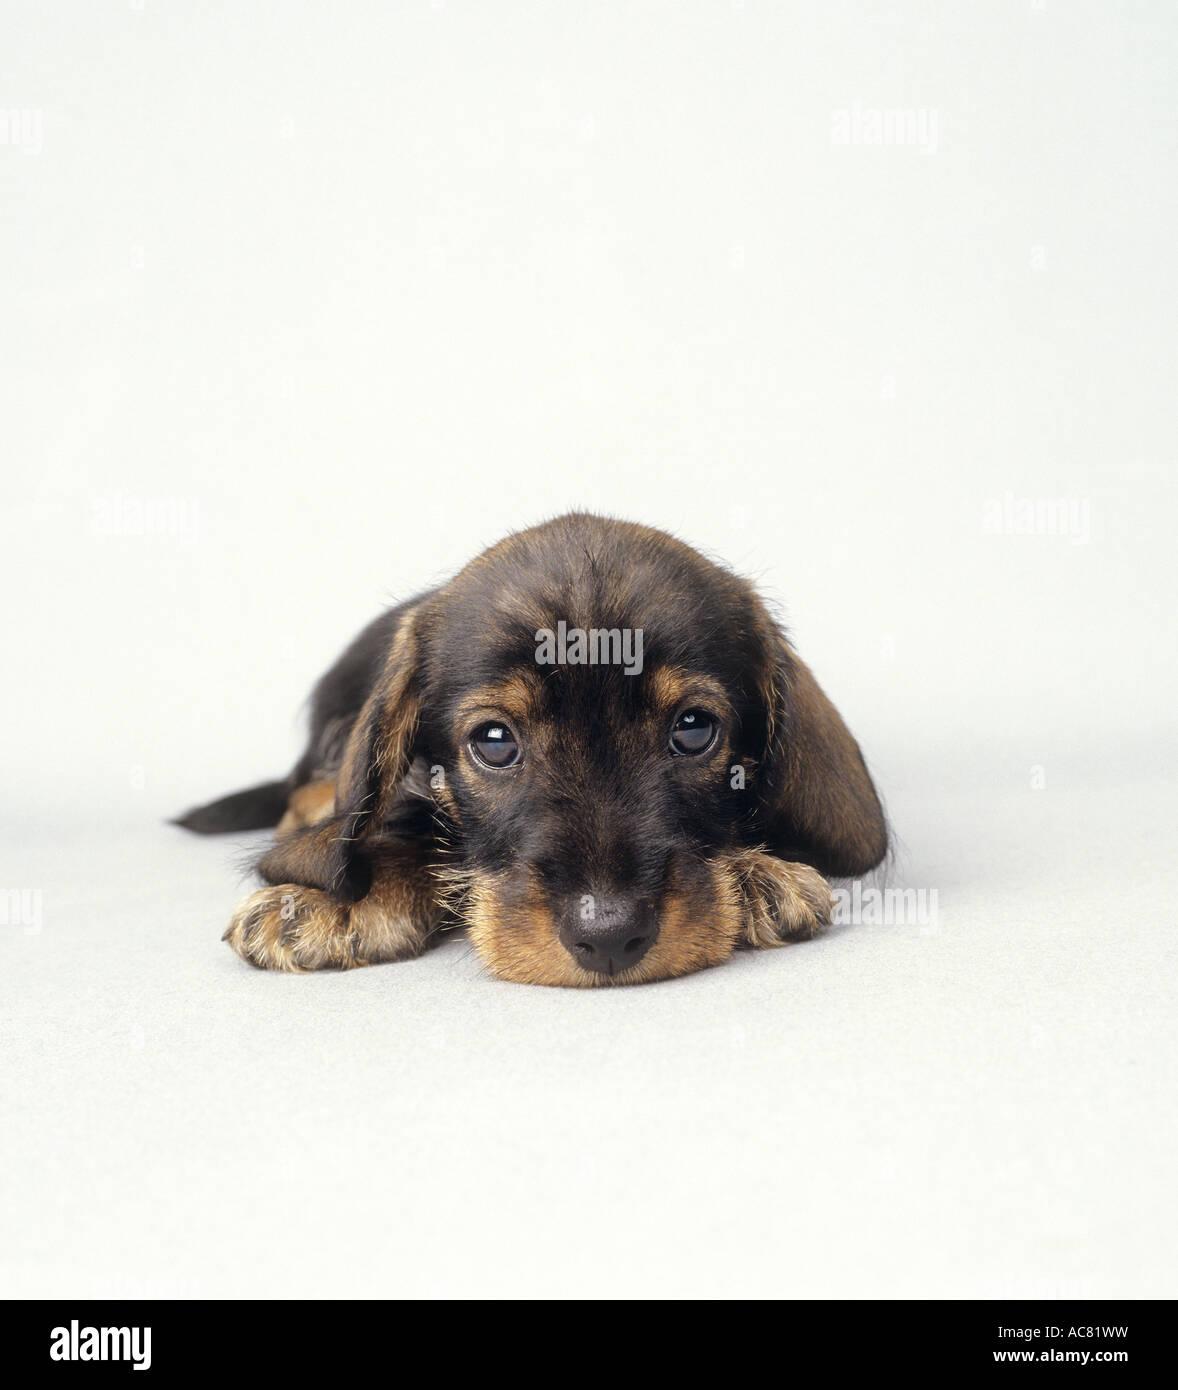 Wirehaired Dachshund Puppy Stock Photos & Wirehaired Dachshund Puppy ...